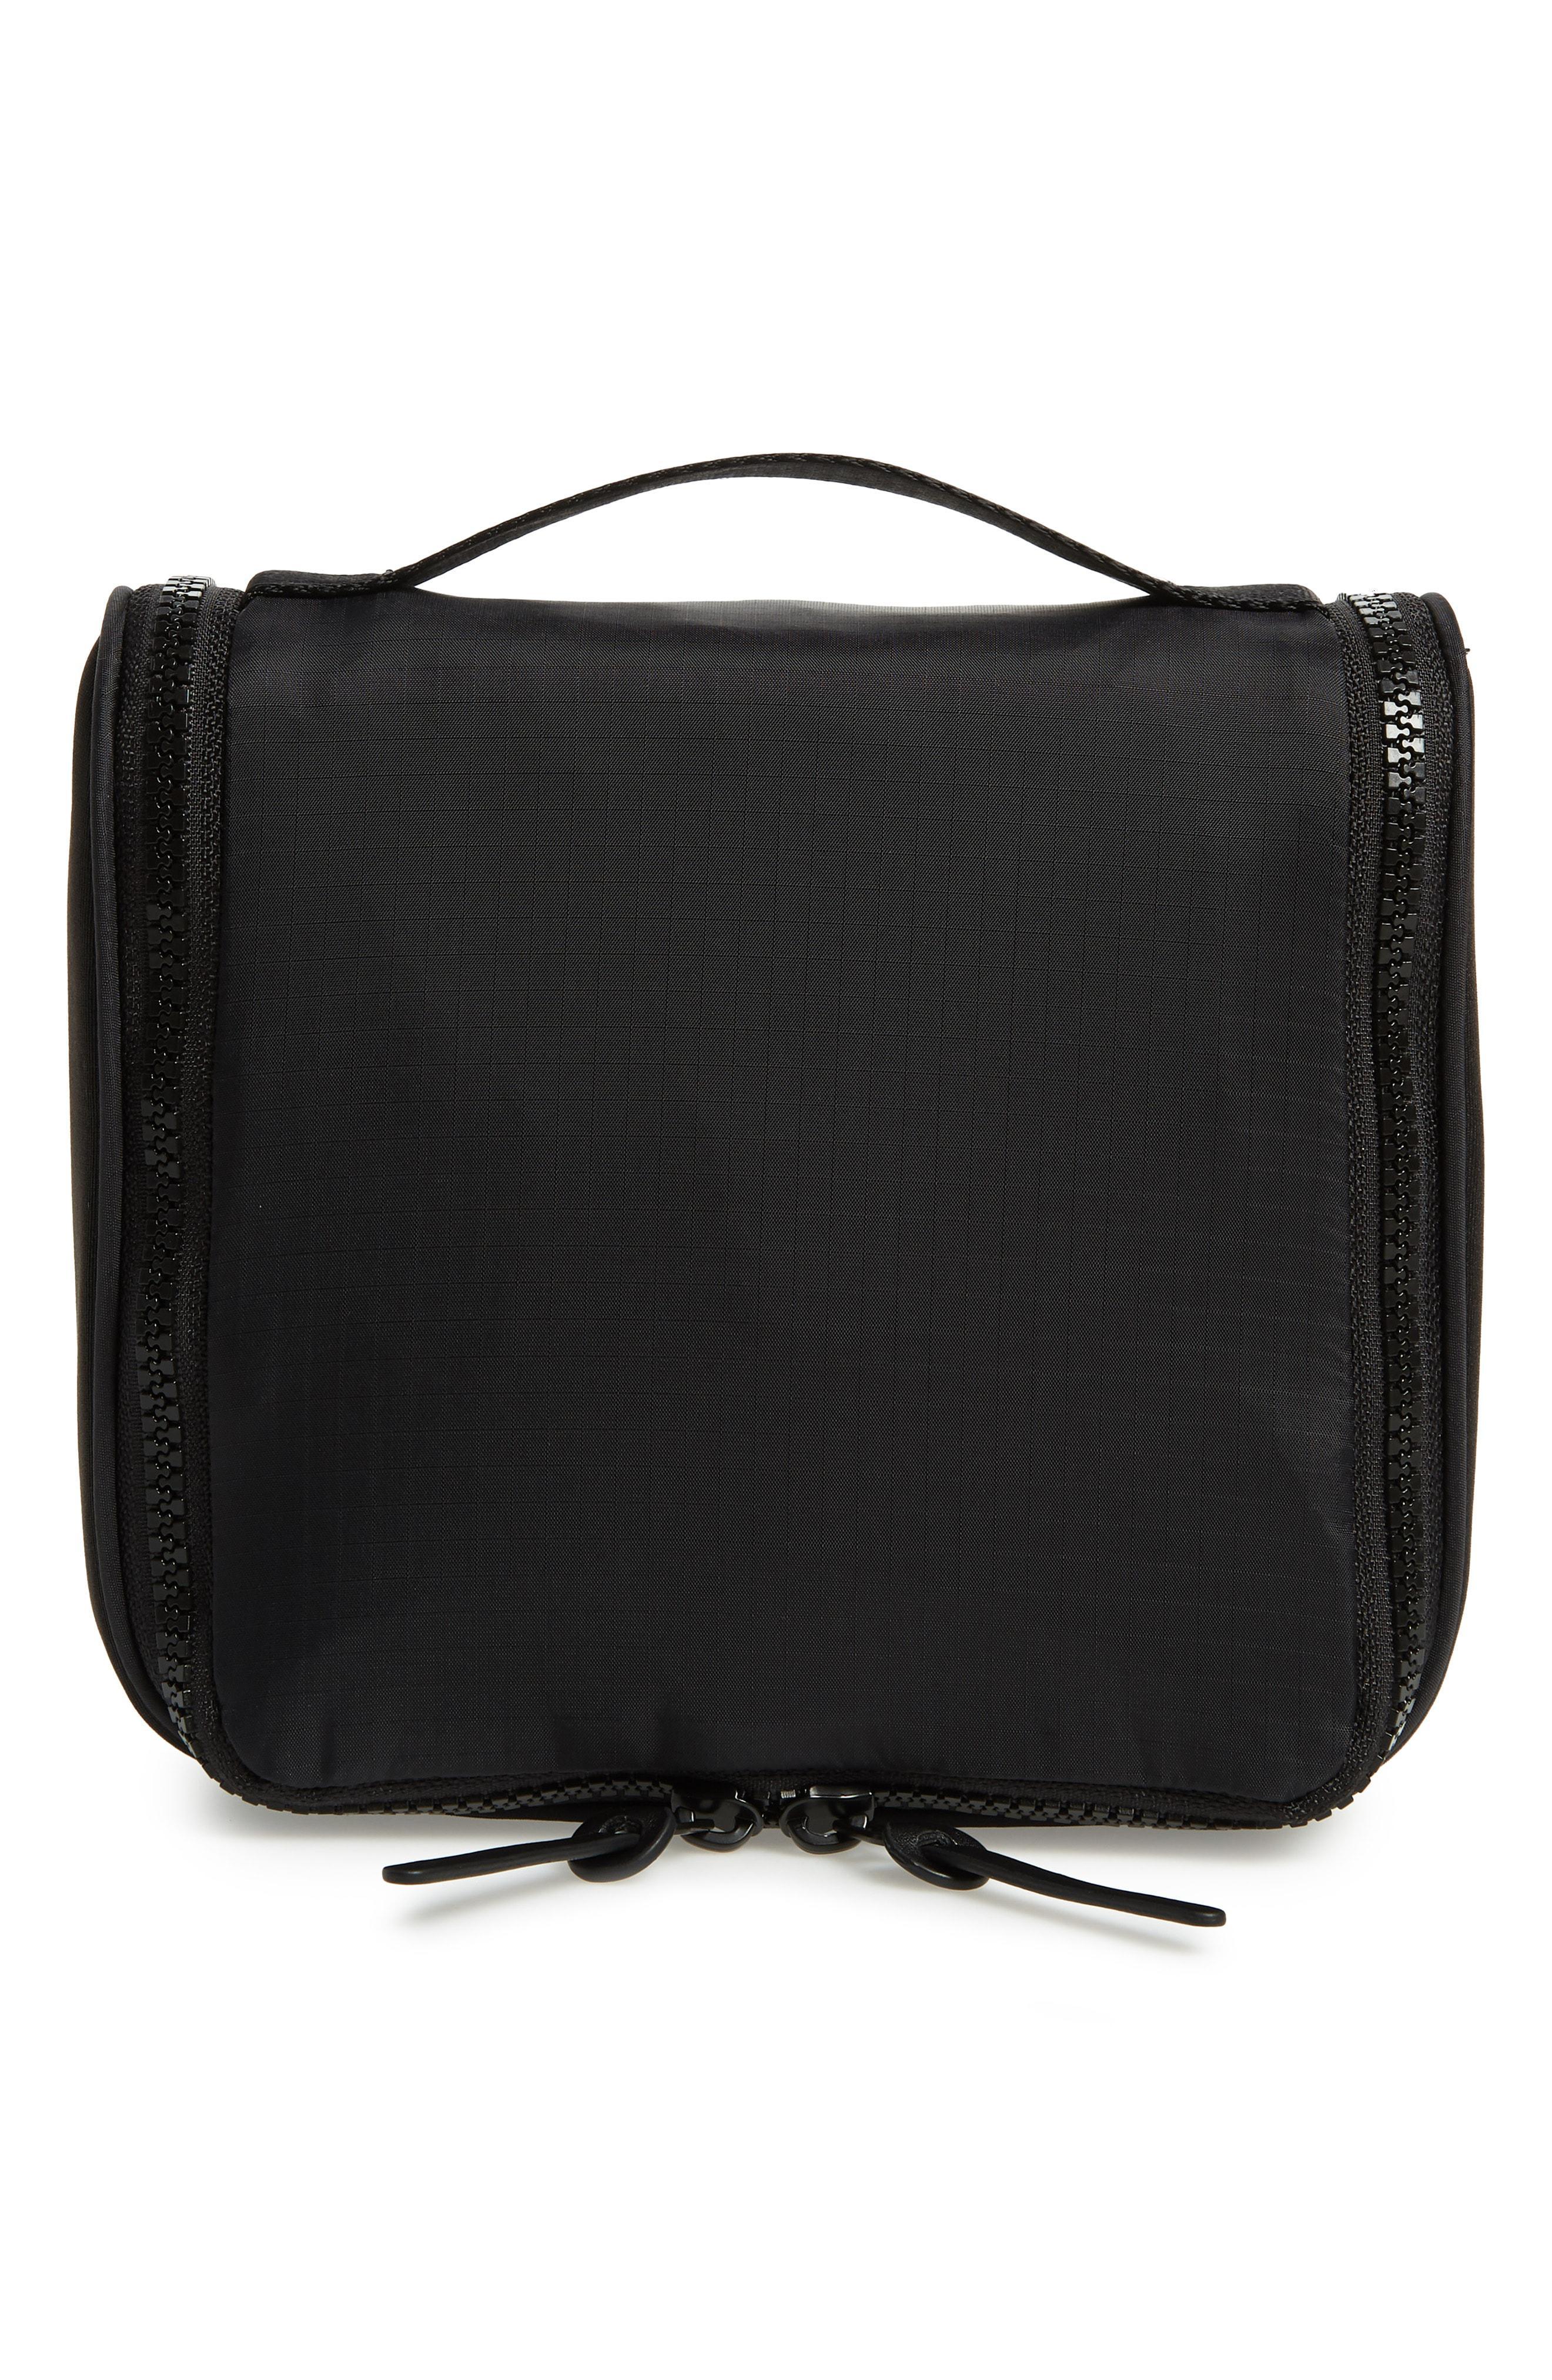 44fb8e7c27b2 Lyst - Nordstrom Toiletry Bag in Black